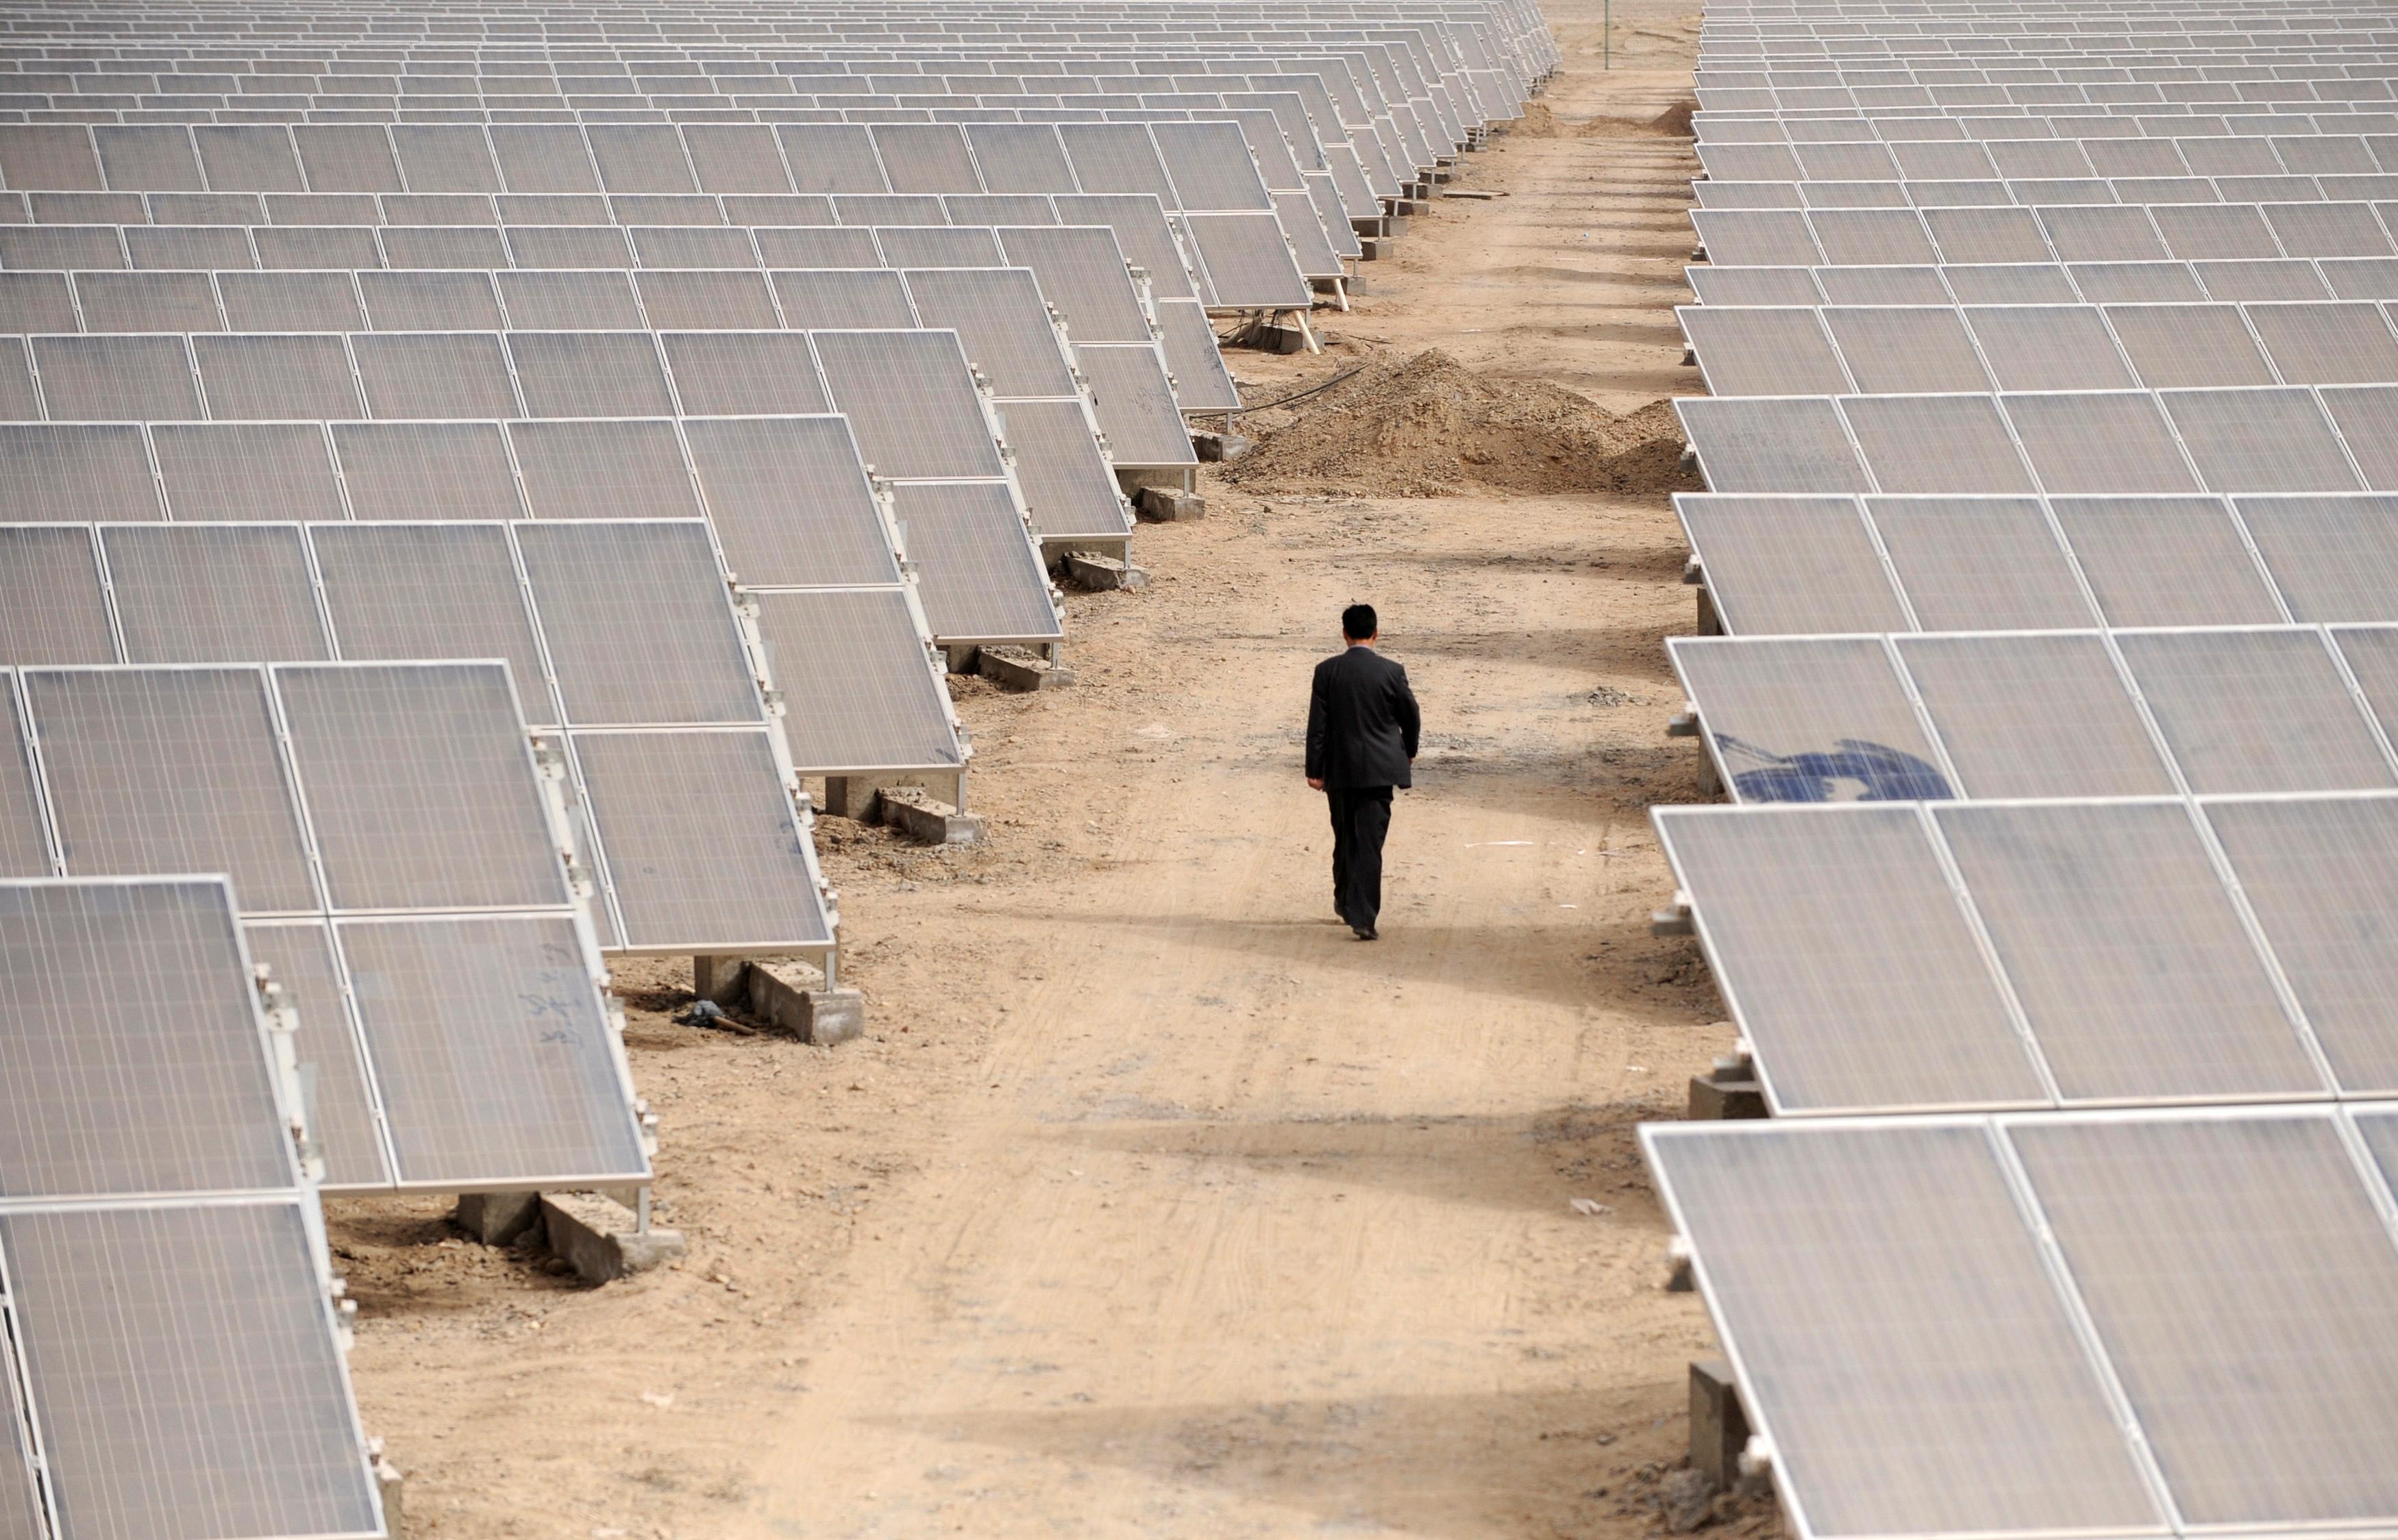 A man walks through solar panels at a solar power plant under construction in Aksu, Xinjiang Uyghur Autonomous Region April 5, 2012. REUTERS/Stringer/File Photo